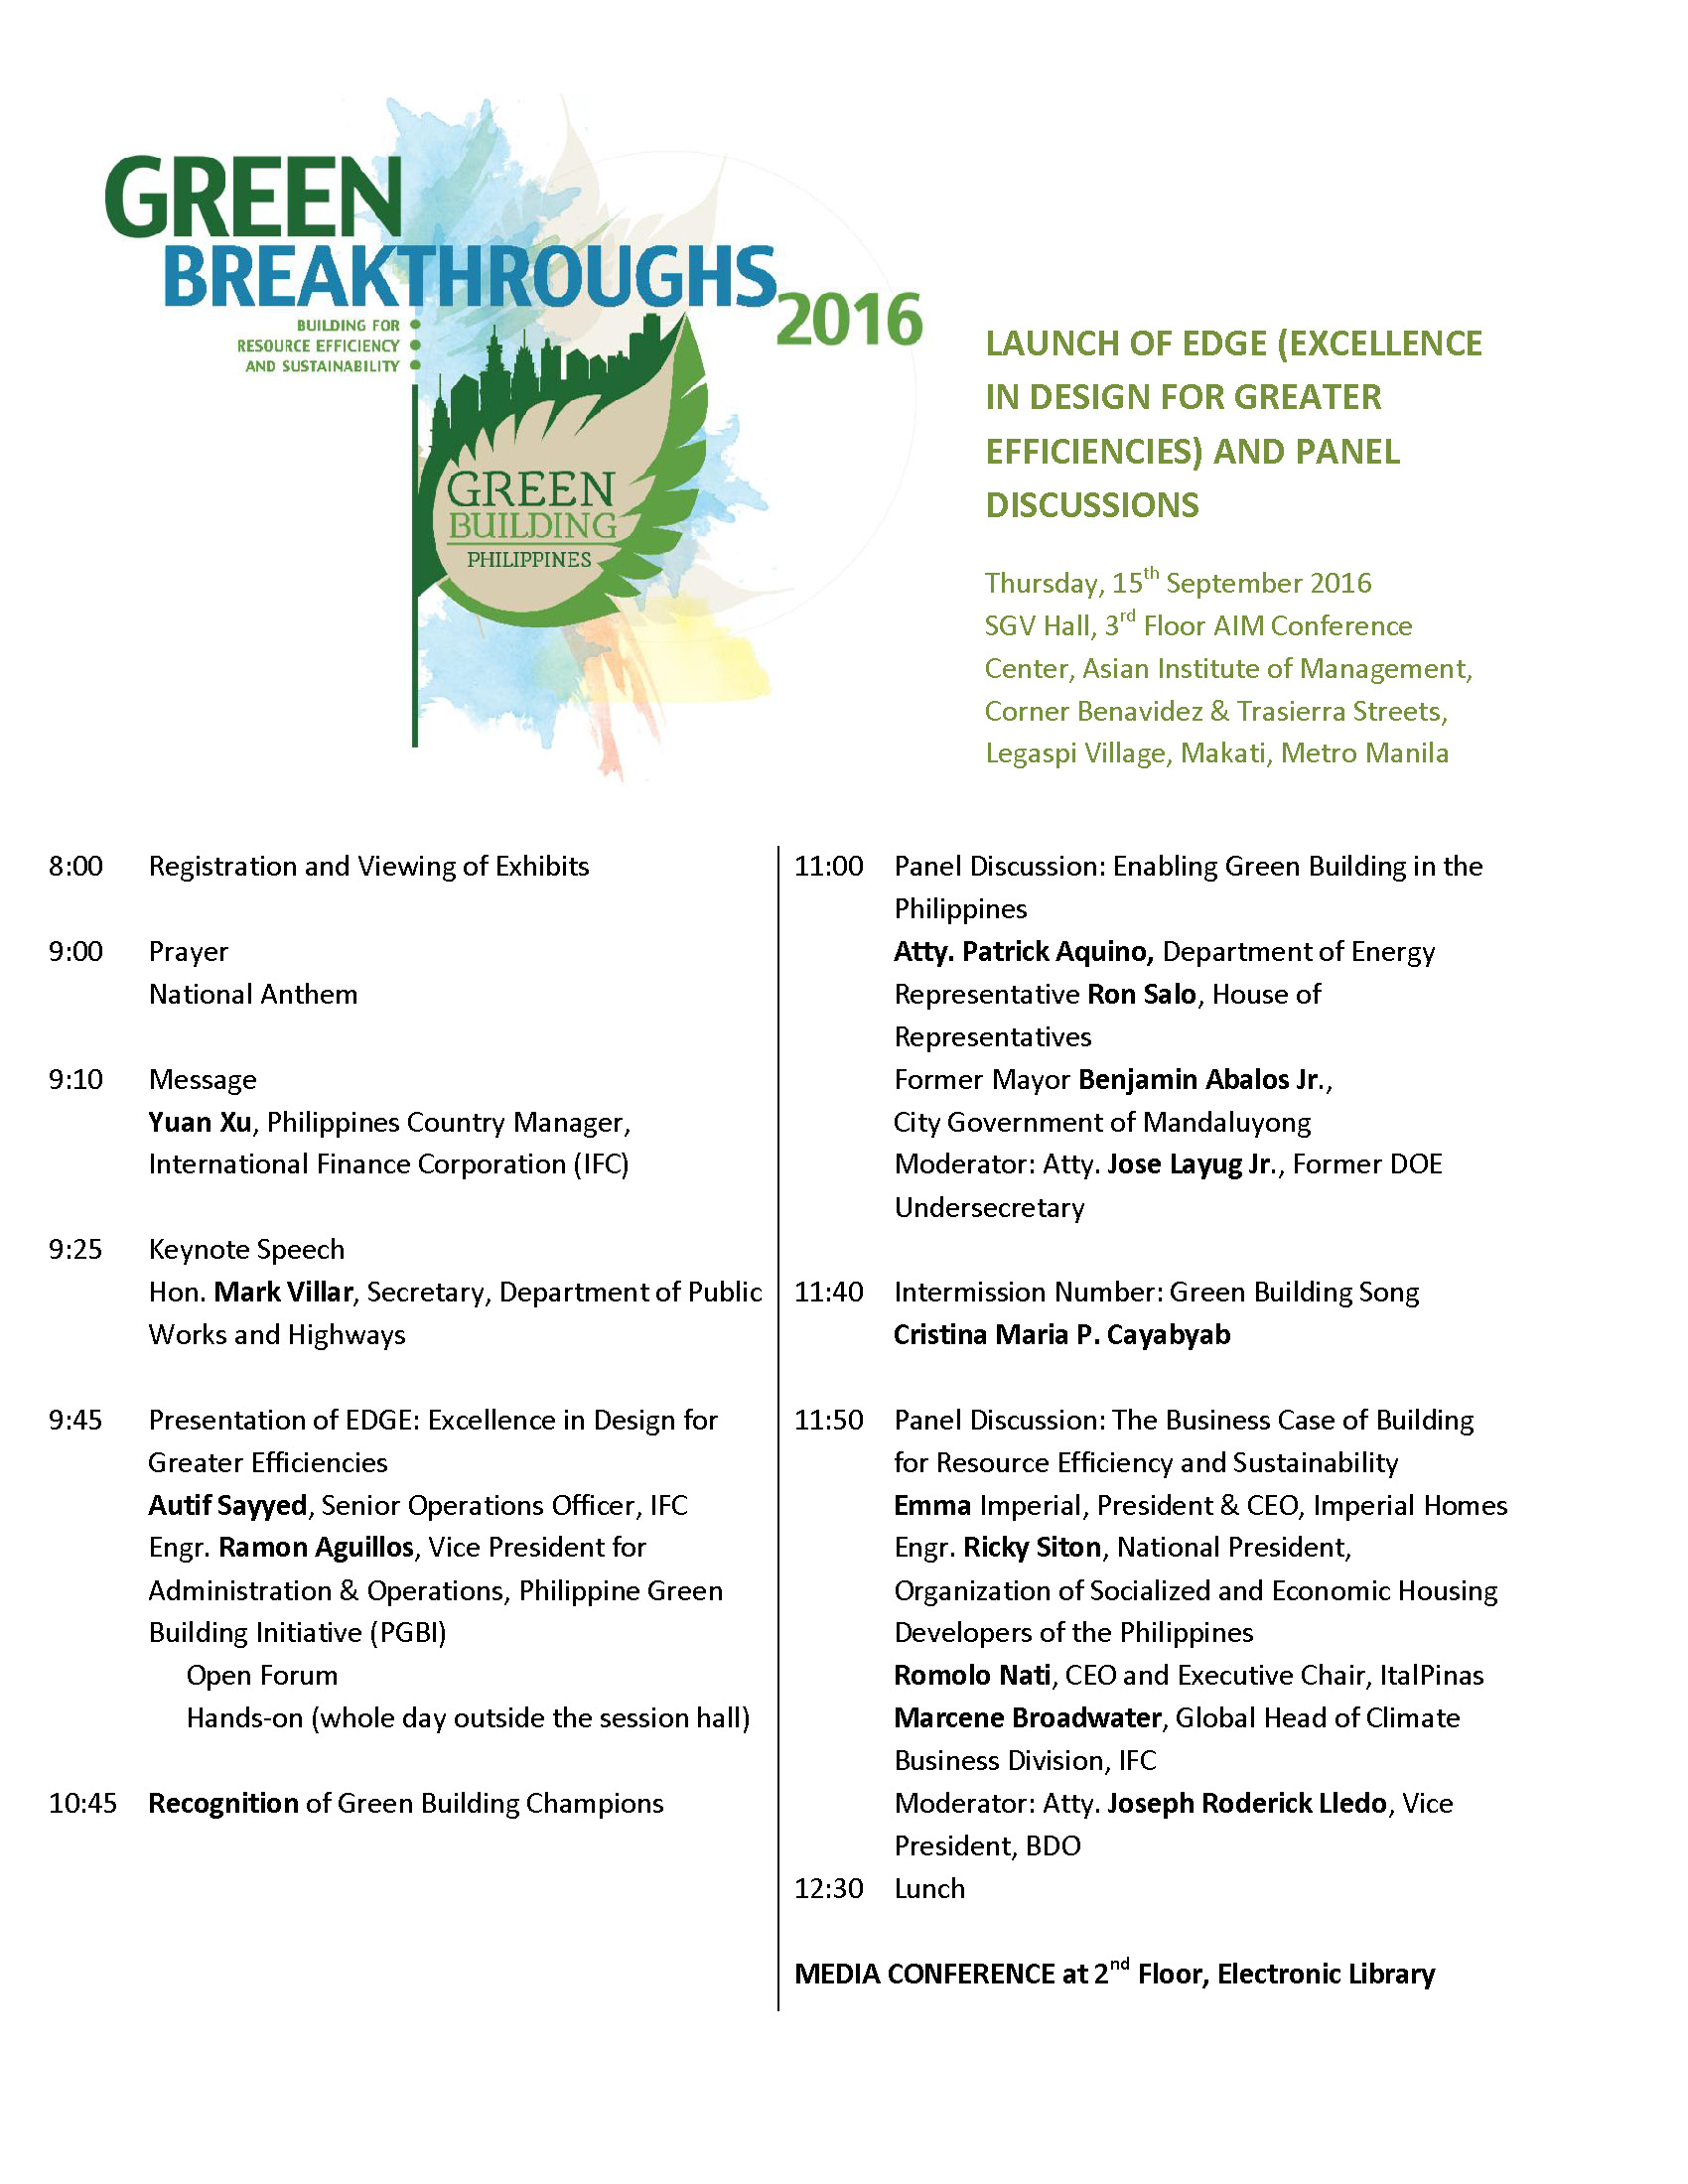 green-breakthroughs-2016-program_page_1